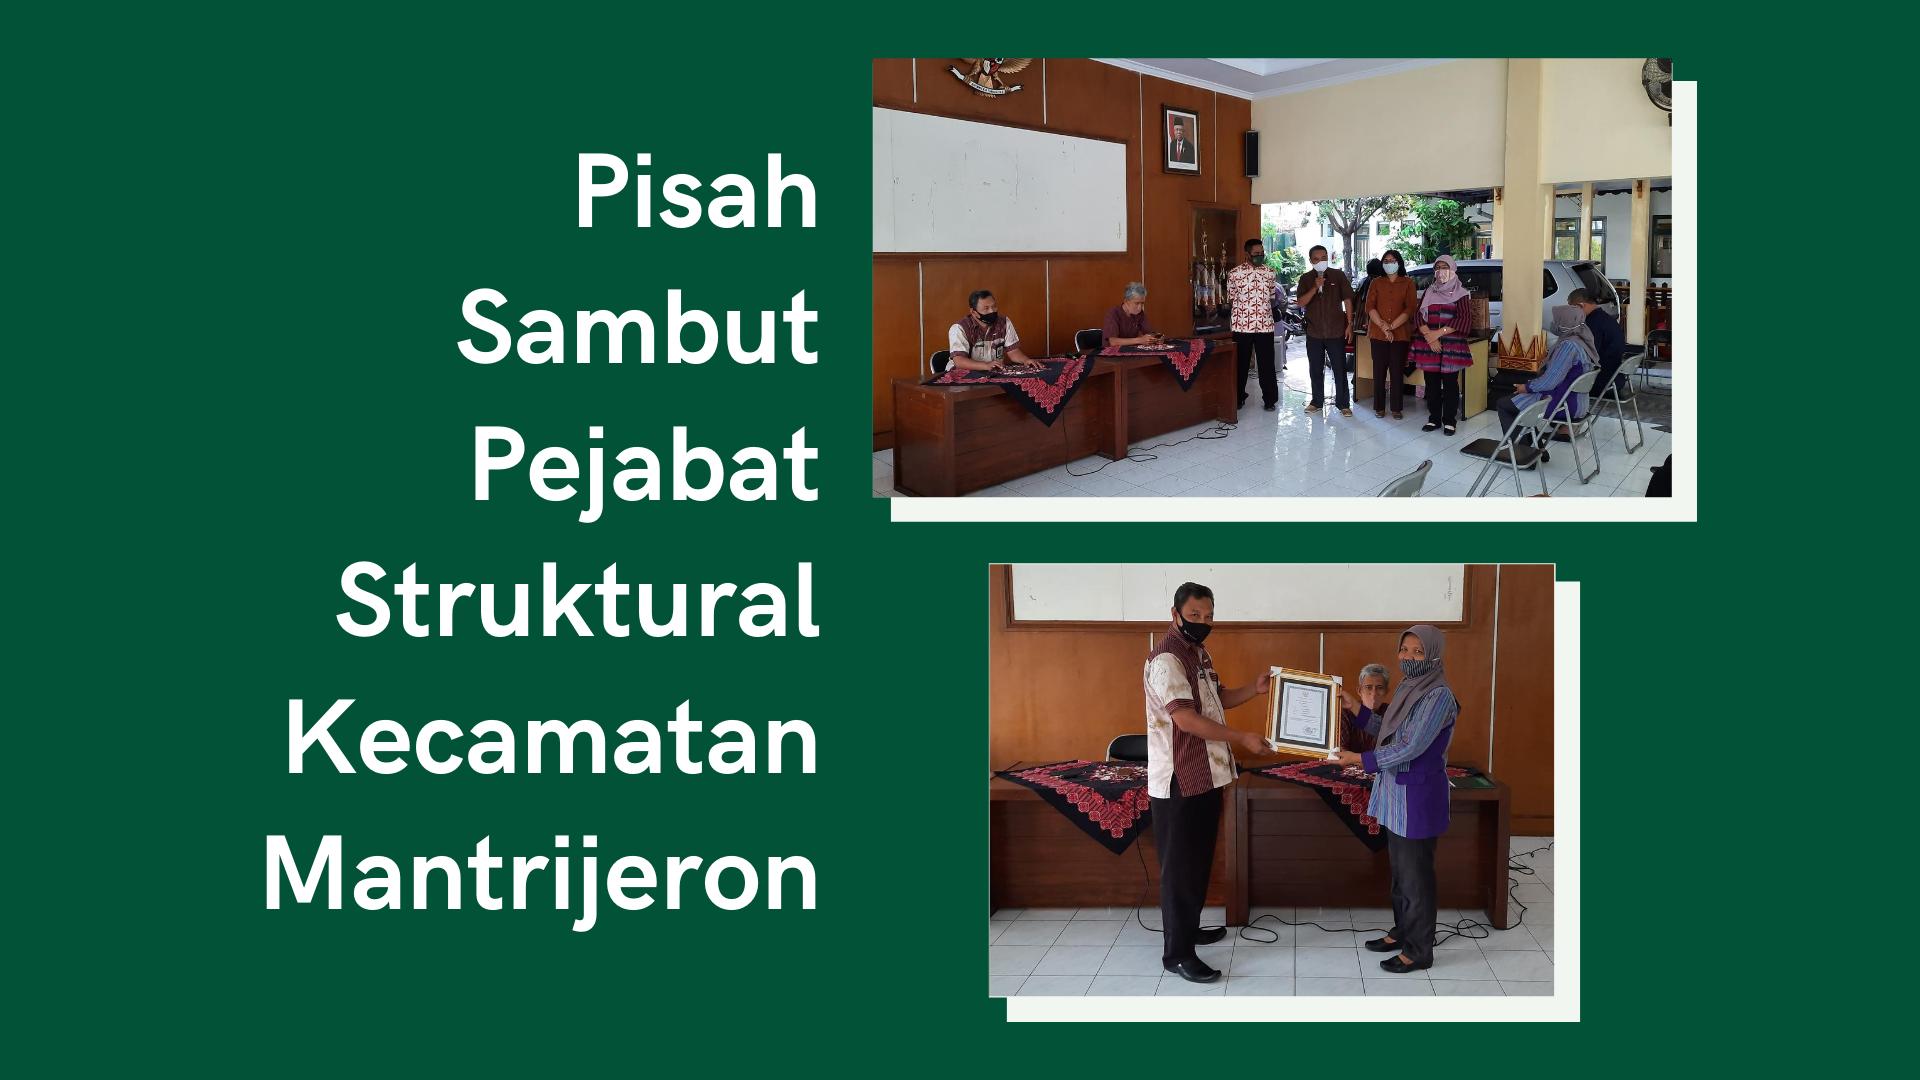 Pisah Sambut Pejabat Struktural Kecamatan Mantrijeron